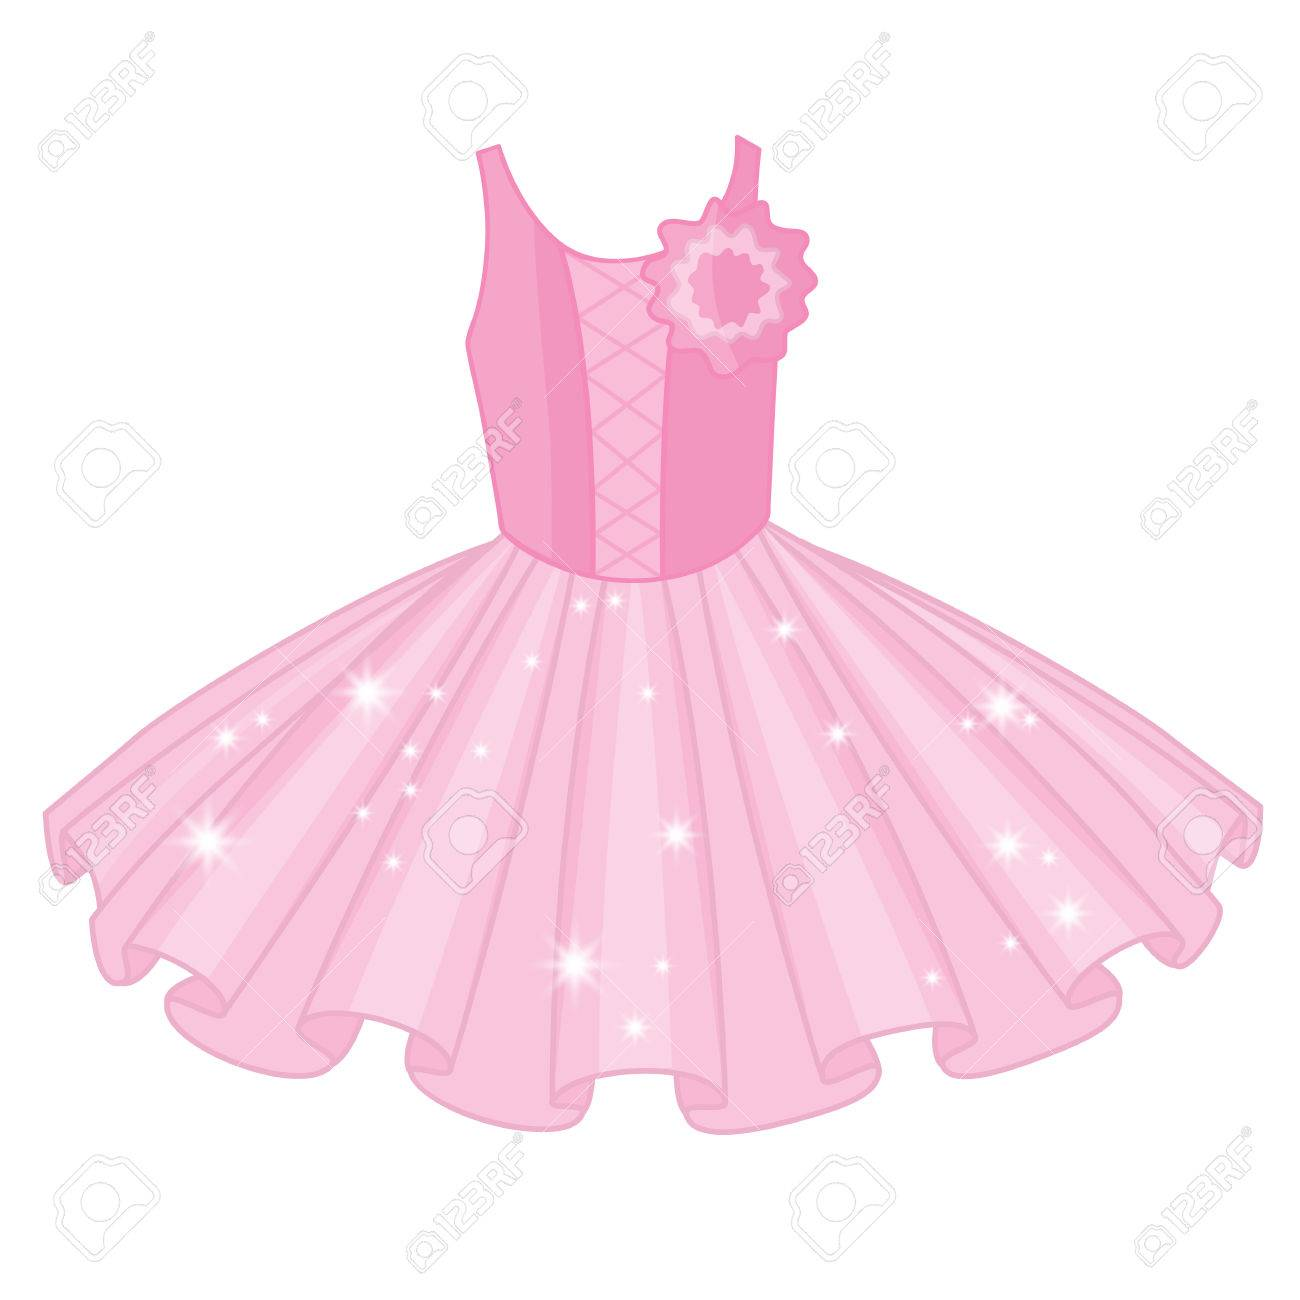 Vector soft pink tutu dress. Vector ballerina's tutu dresses.